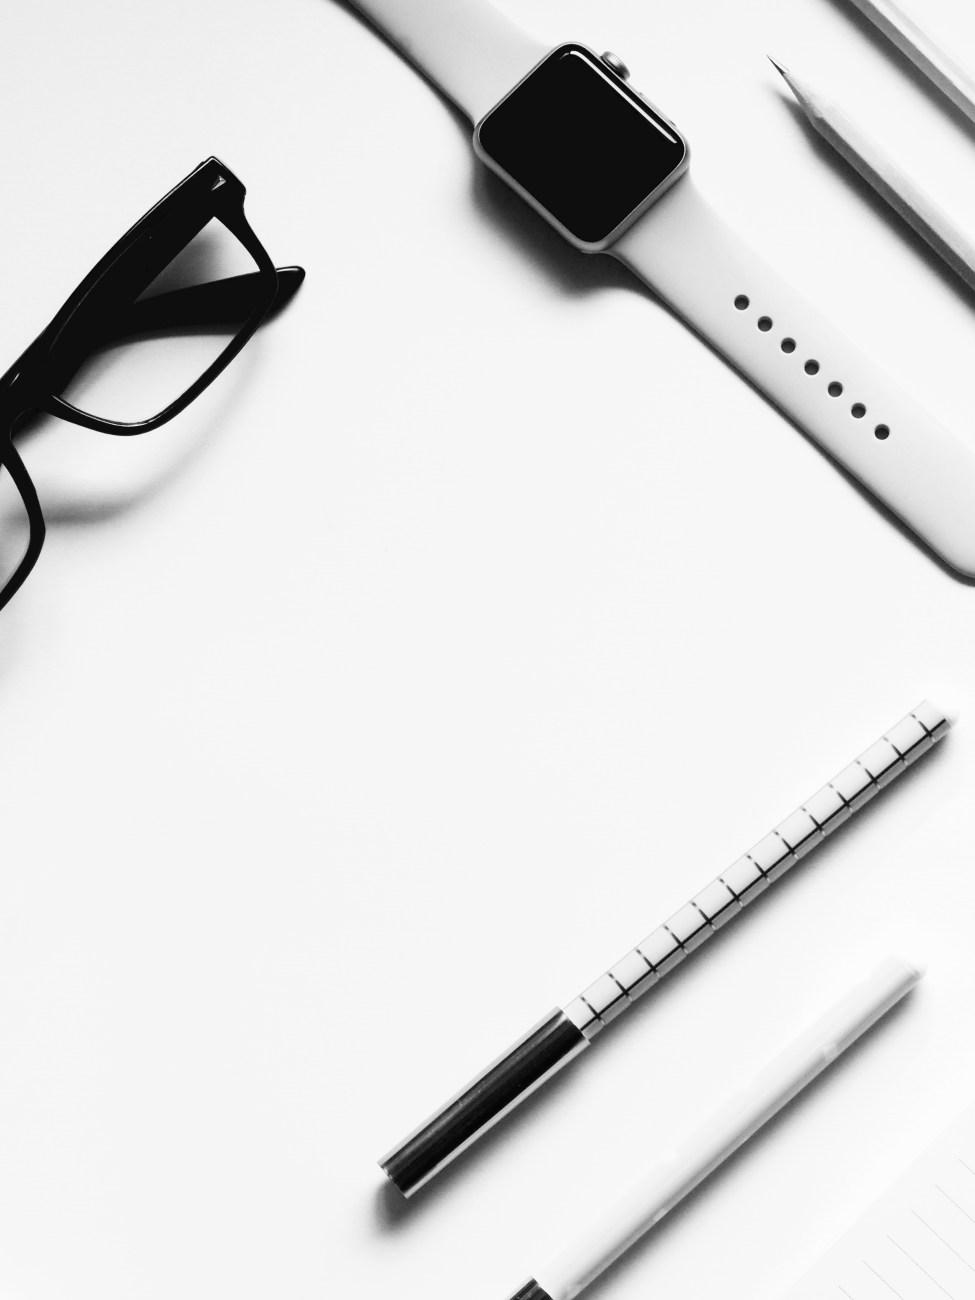 closed apple watch beside eyeglasses on table